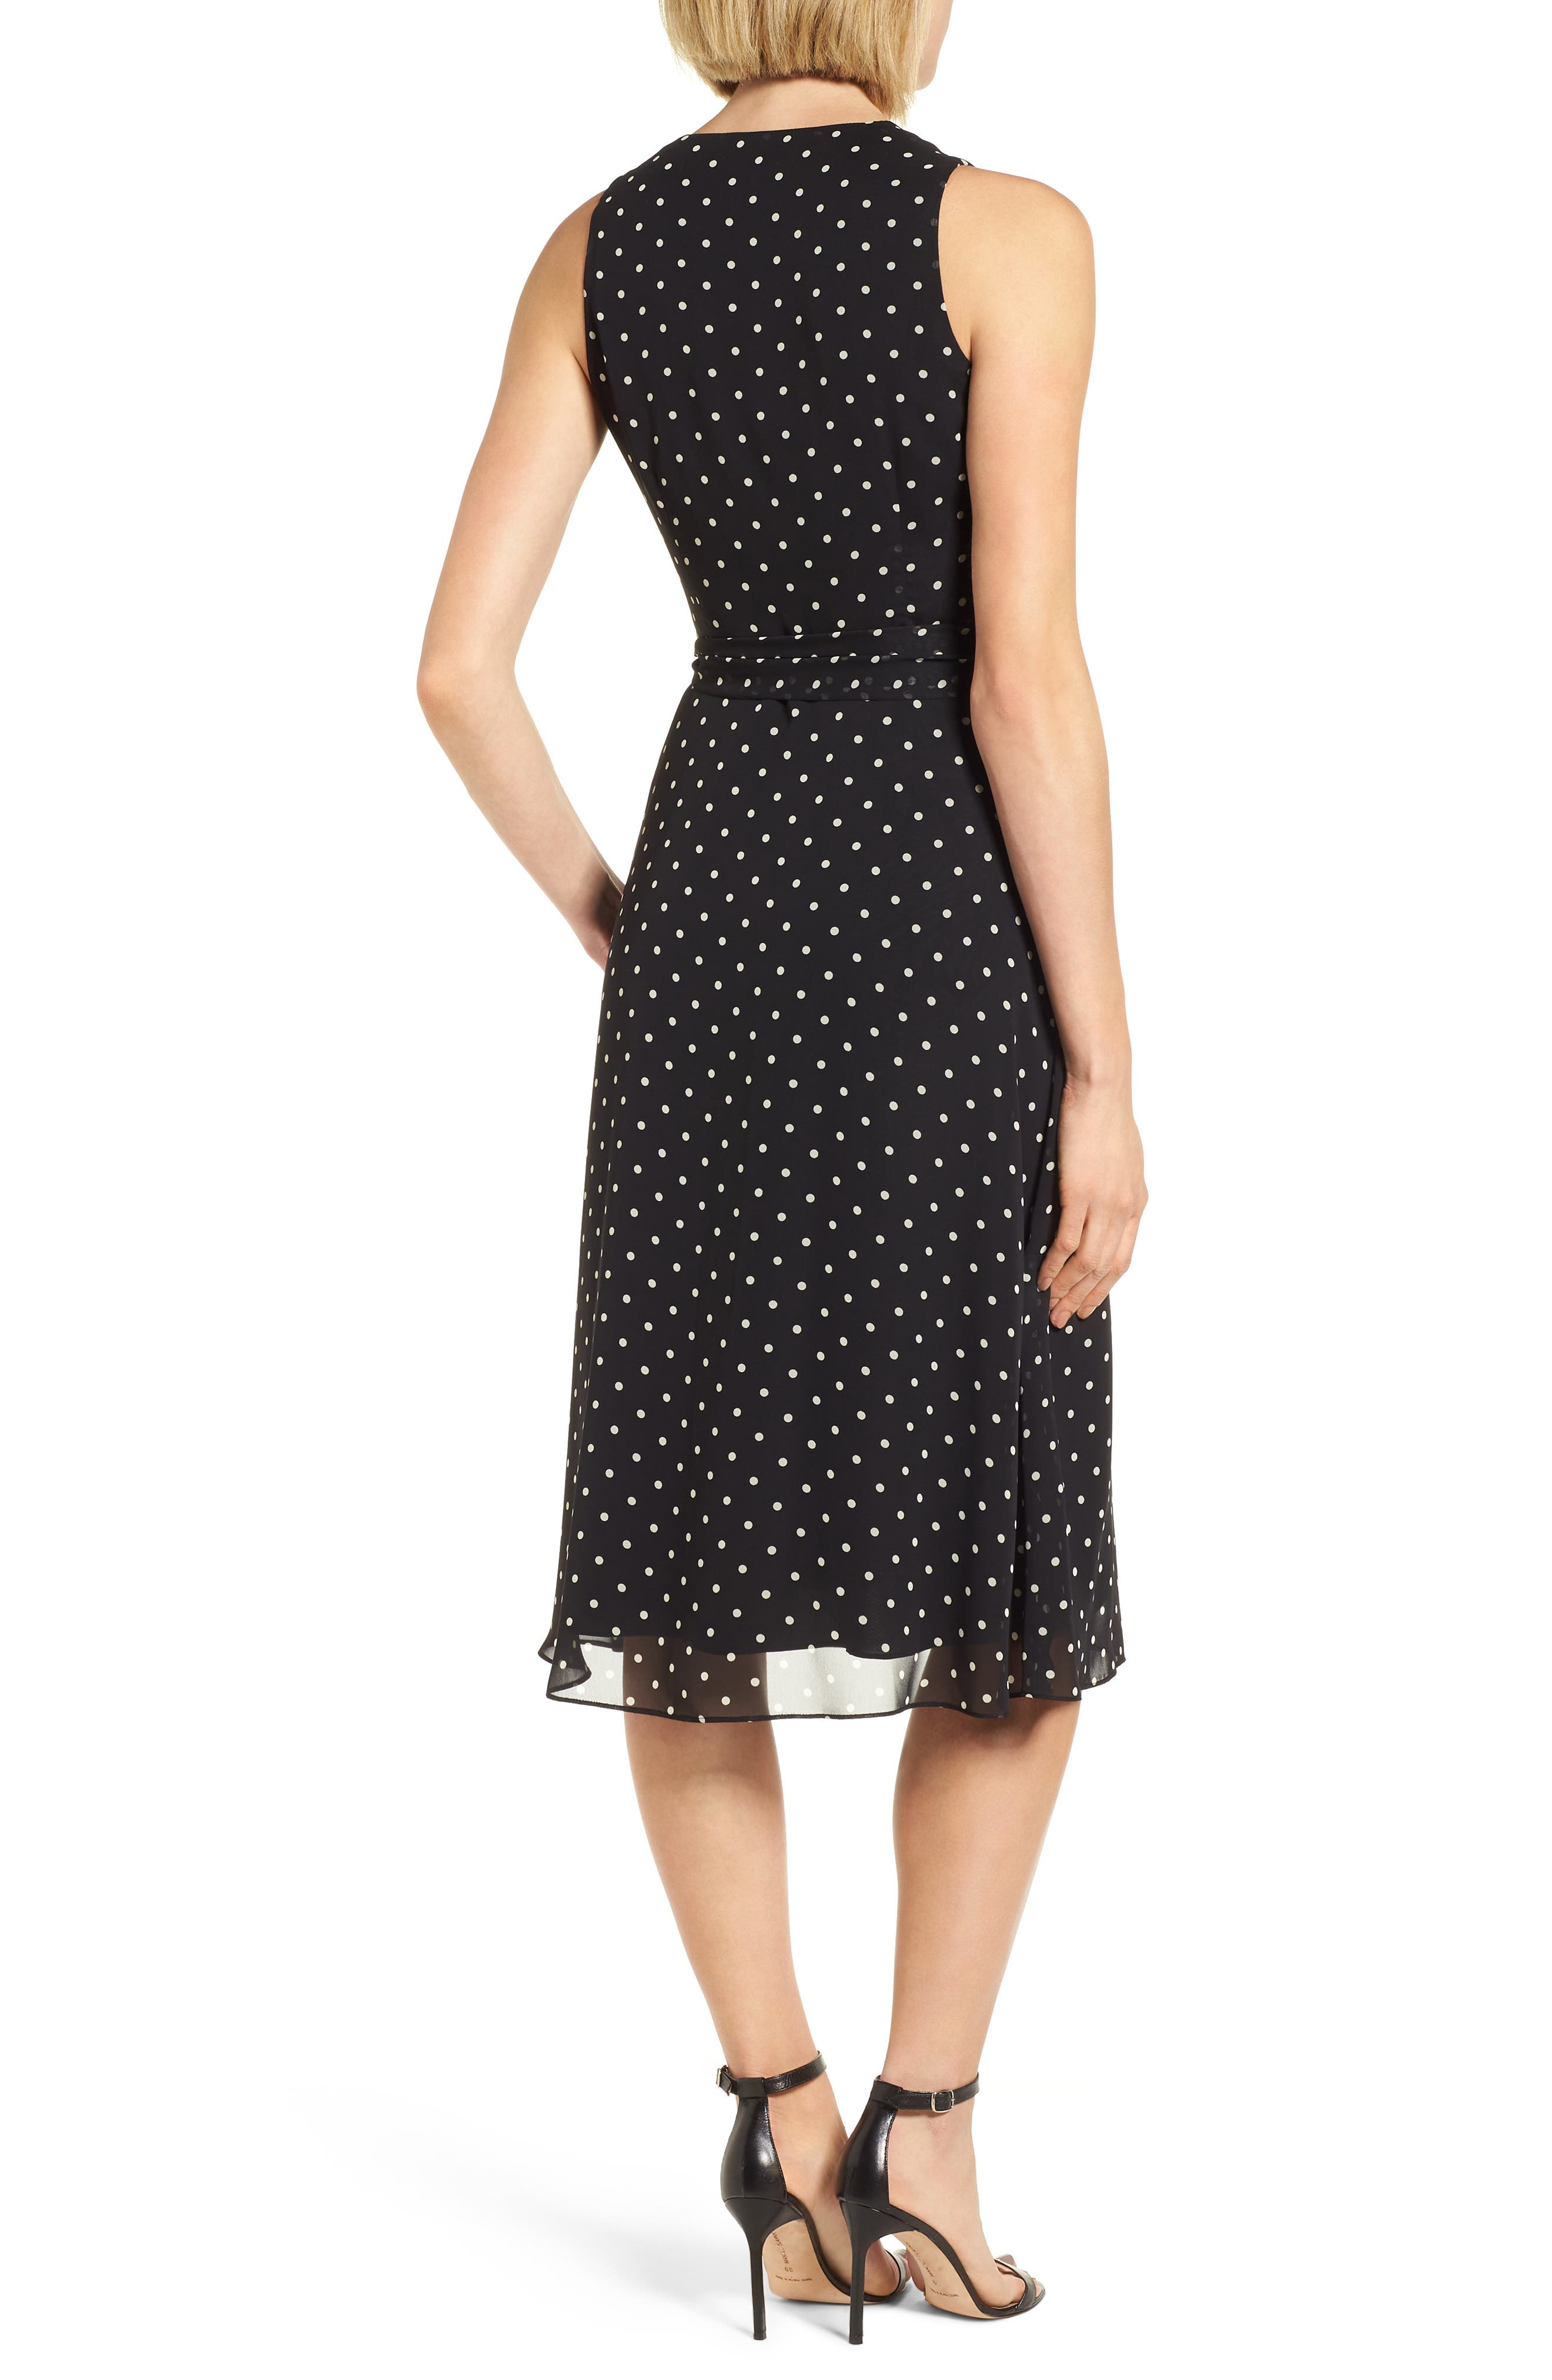 New York Dotted Chiffon Dress,                             Alternate thumbnail 2, color,                             Black/ White